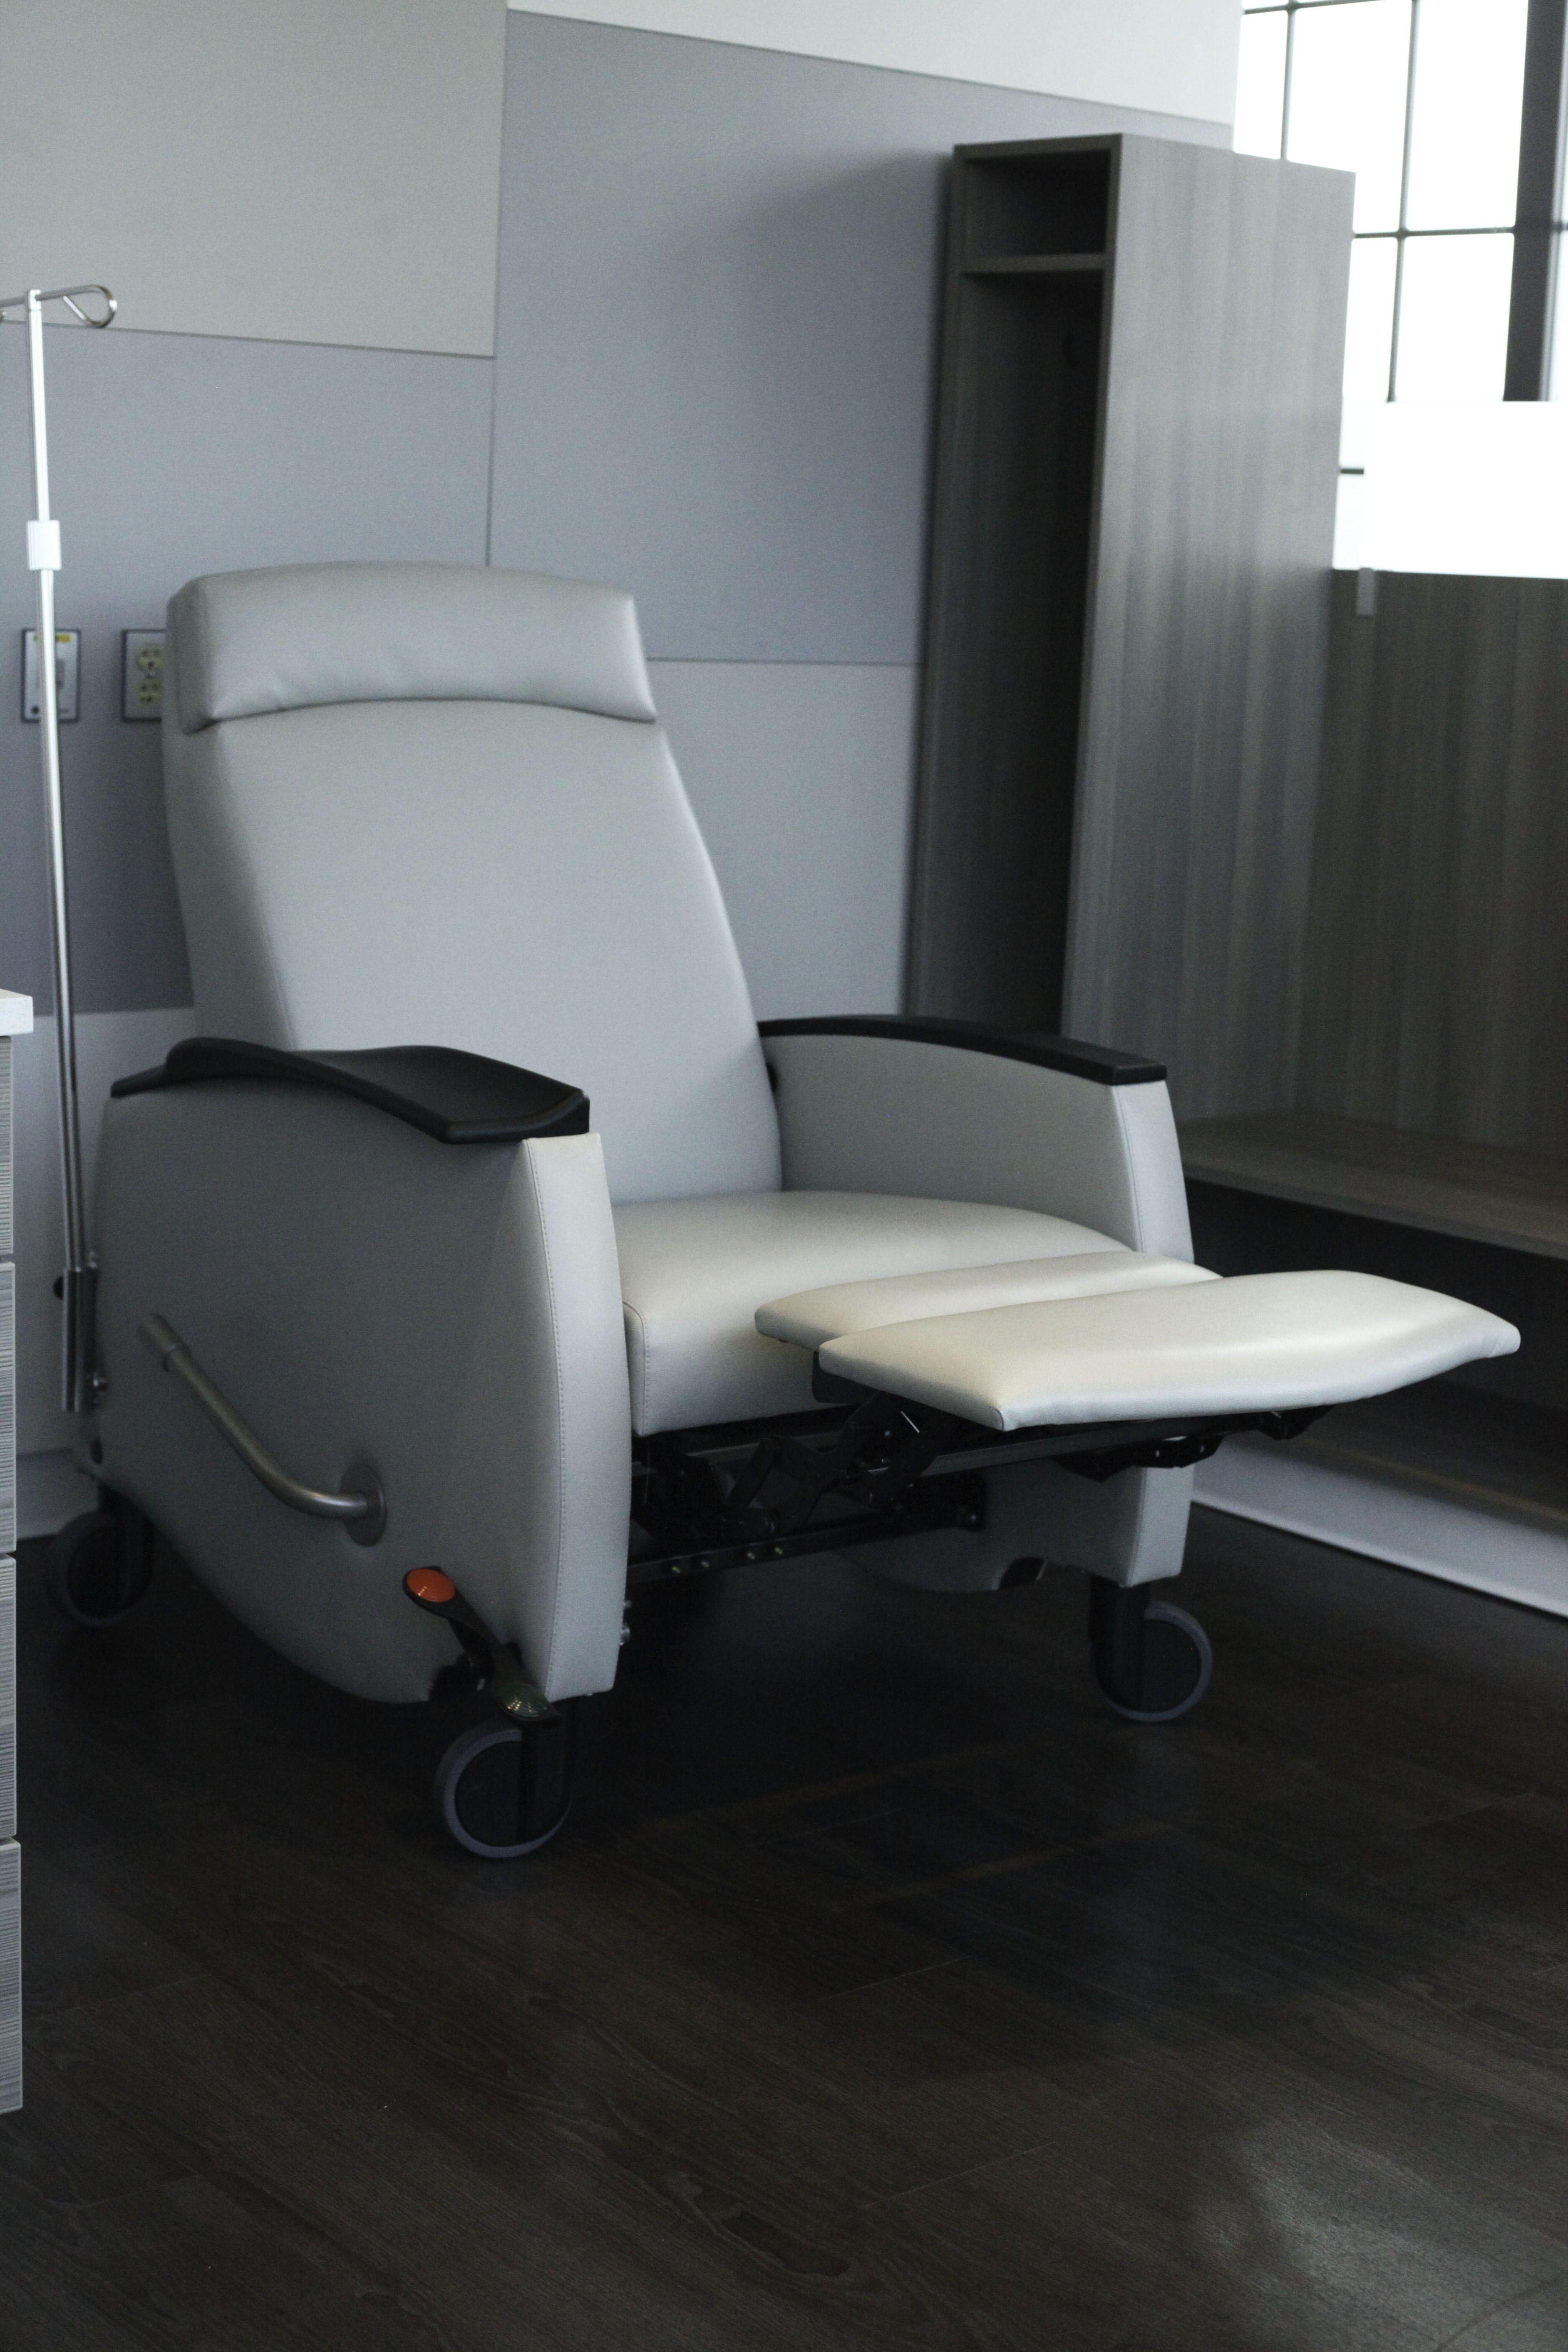 Captivating Orchestra Treatment Recliner | Manufacturer: Carolina Business Furniture |  Manufacturer Website: Http:/